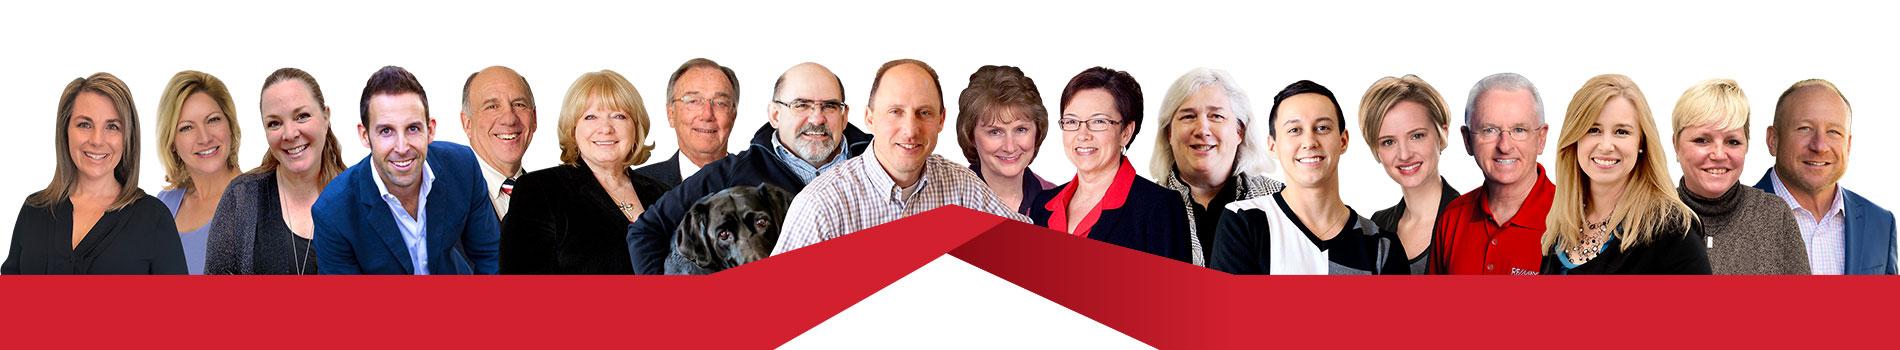 The Wisconsin Real Estate Team - SE Wisconsin Realtors